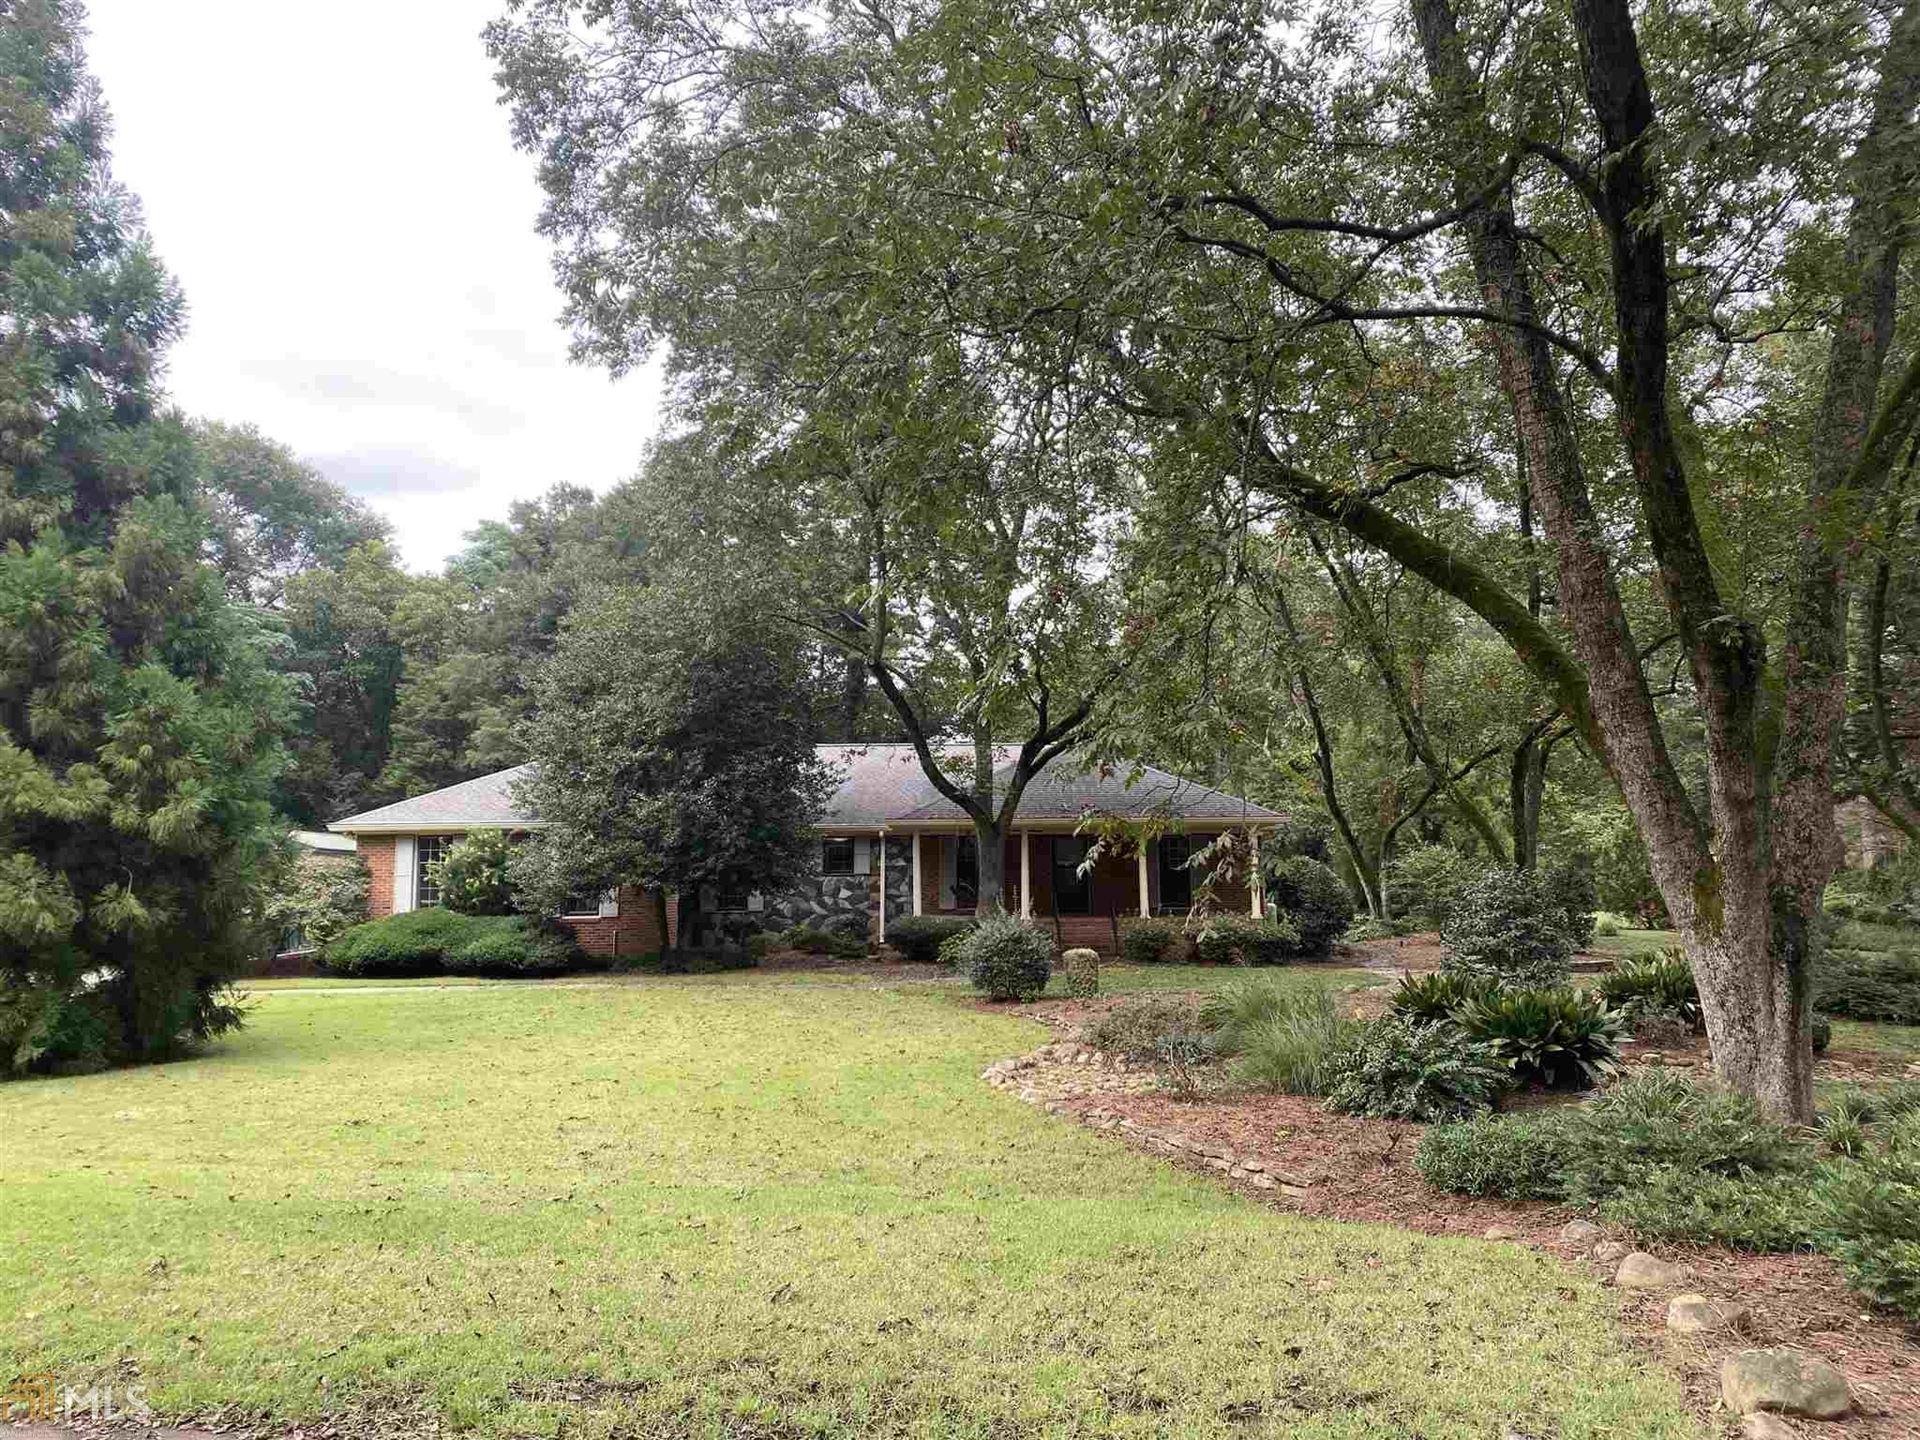 102 Concord Dr, Watkinsville, GA 30677 - #: 8858874